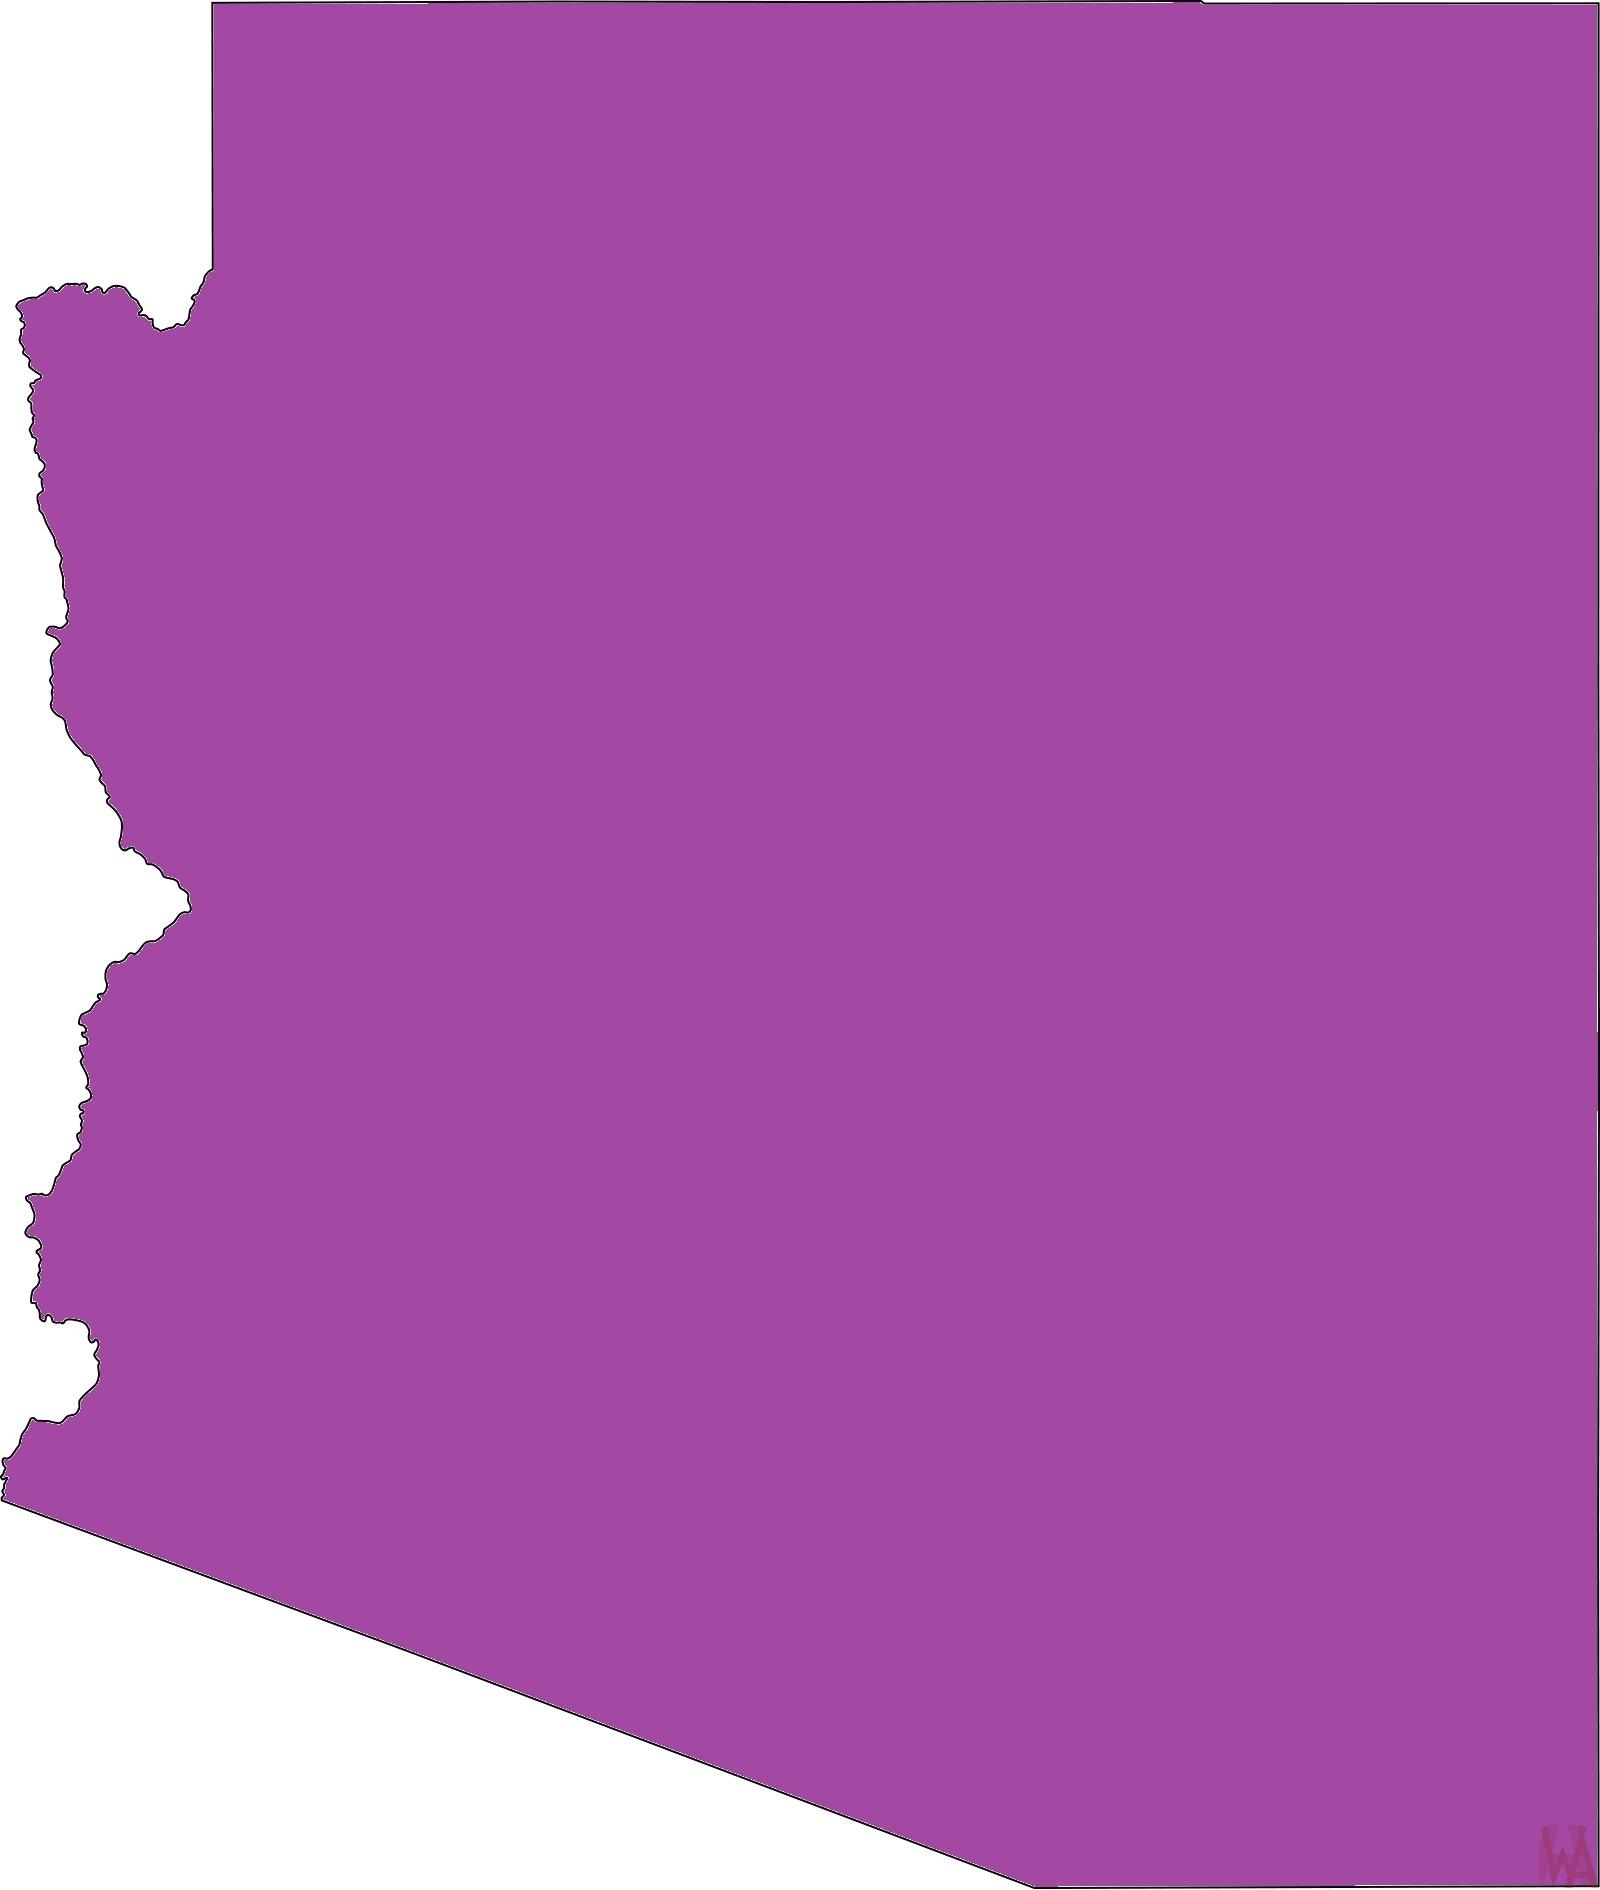 Arizona Blank Outline Map |  Blank Outline Map of Arizona – 3